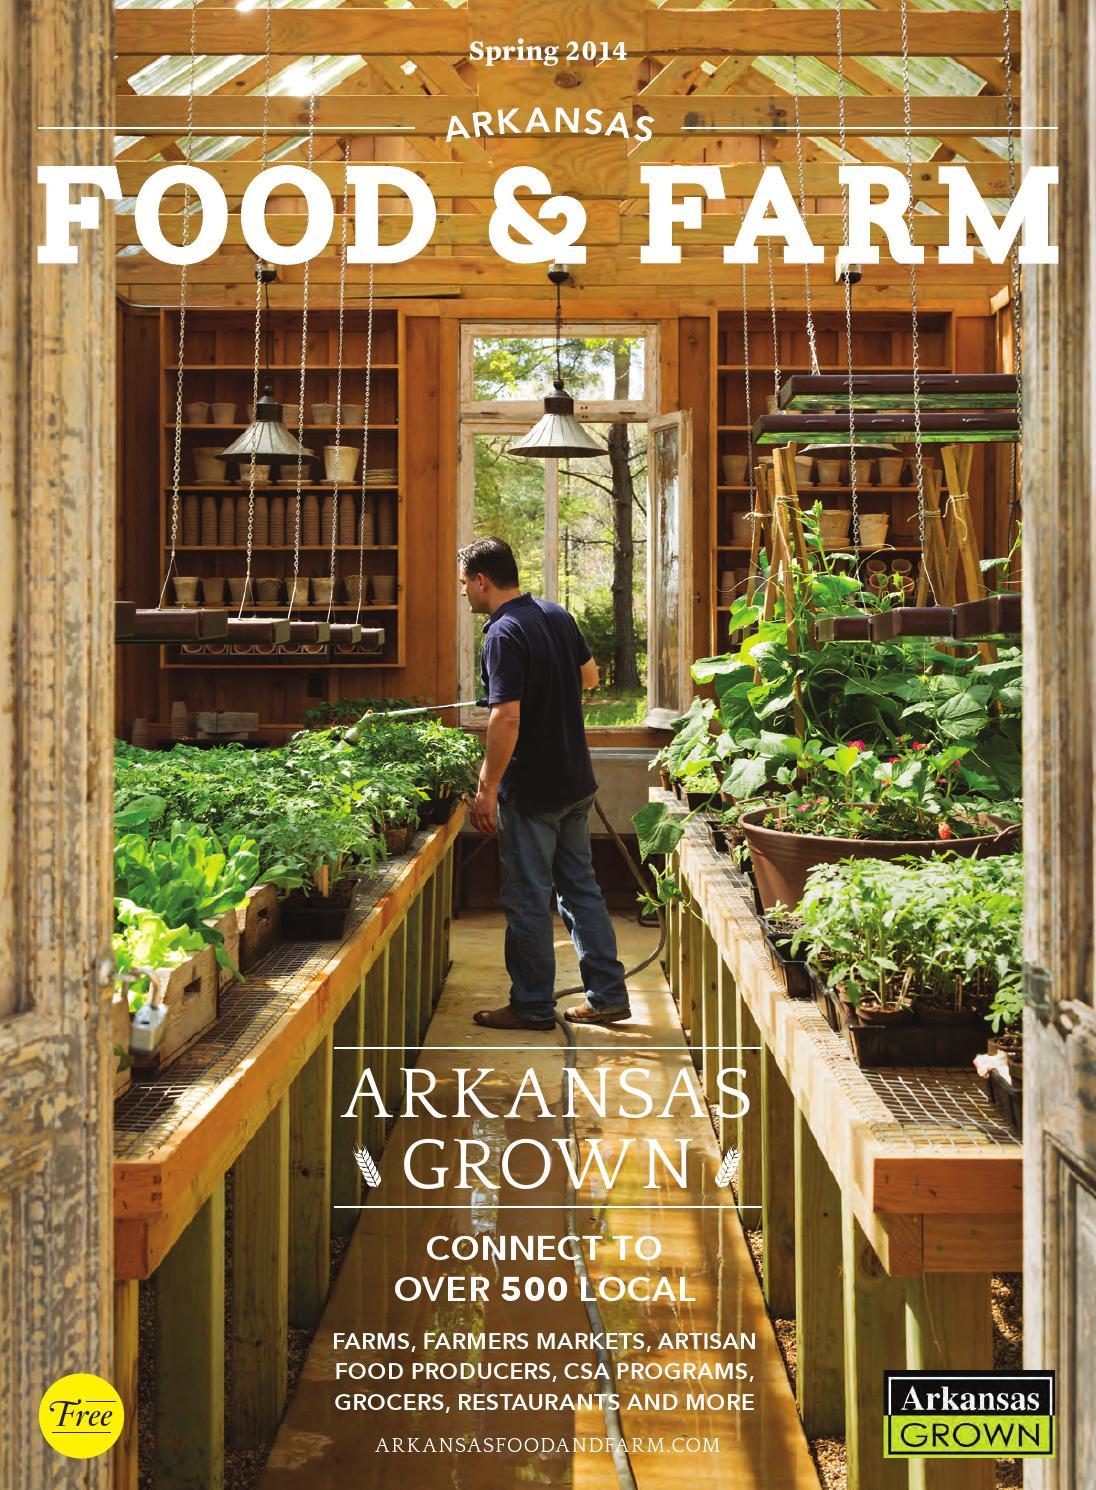 Arkansas Food & Farm - Spring 2014 by Arkansas Times - issuu